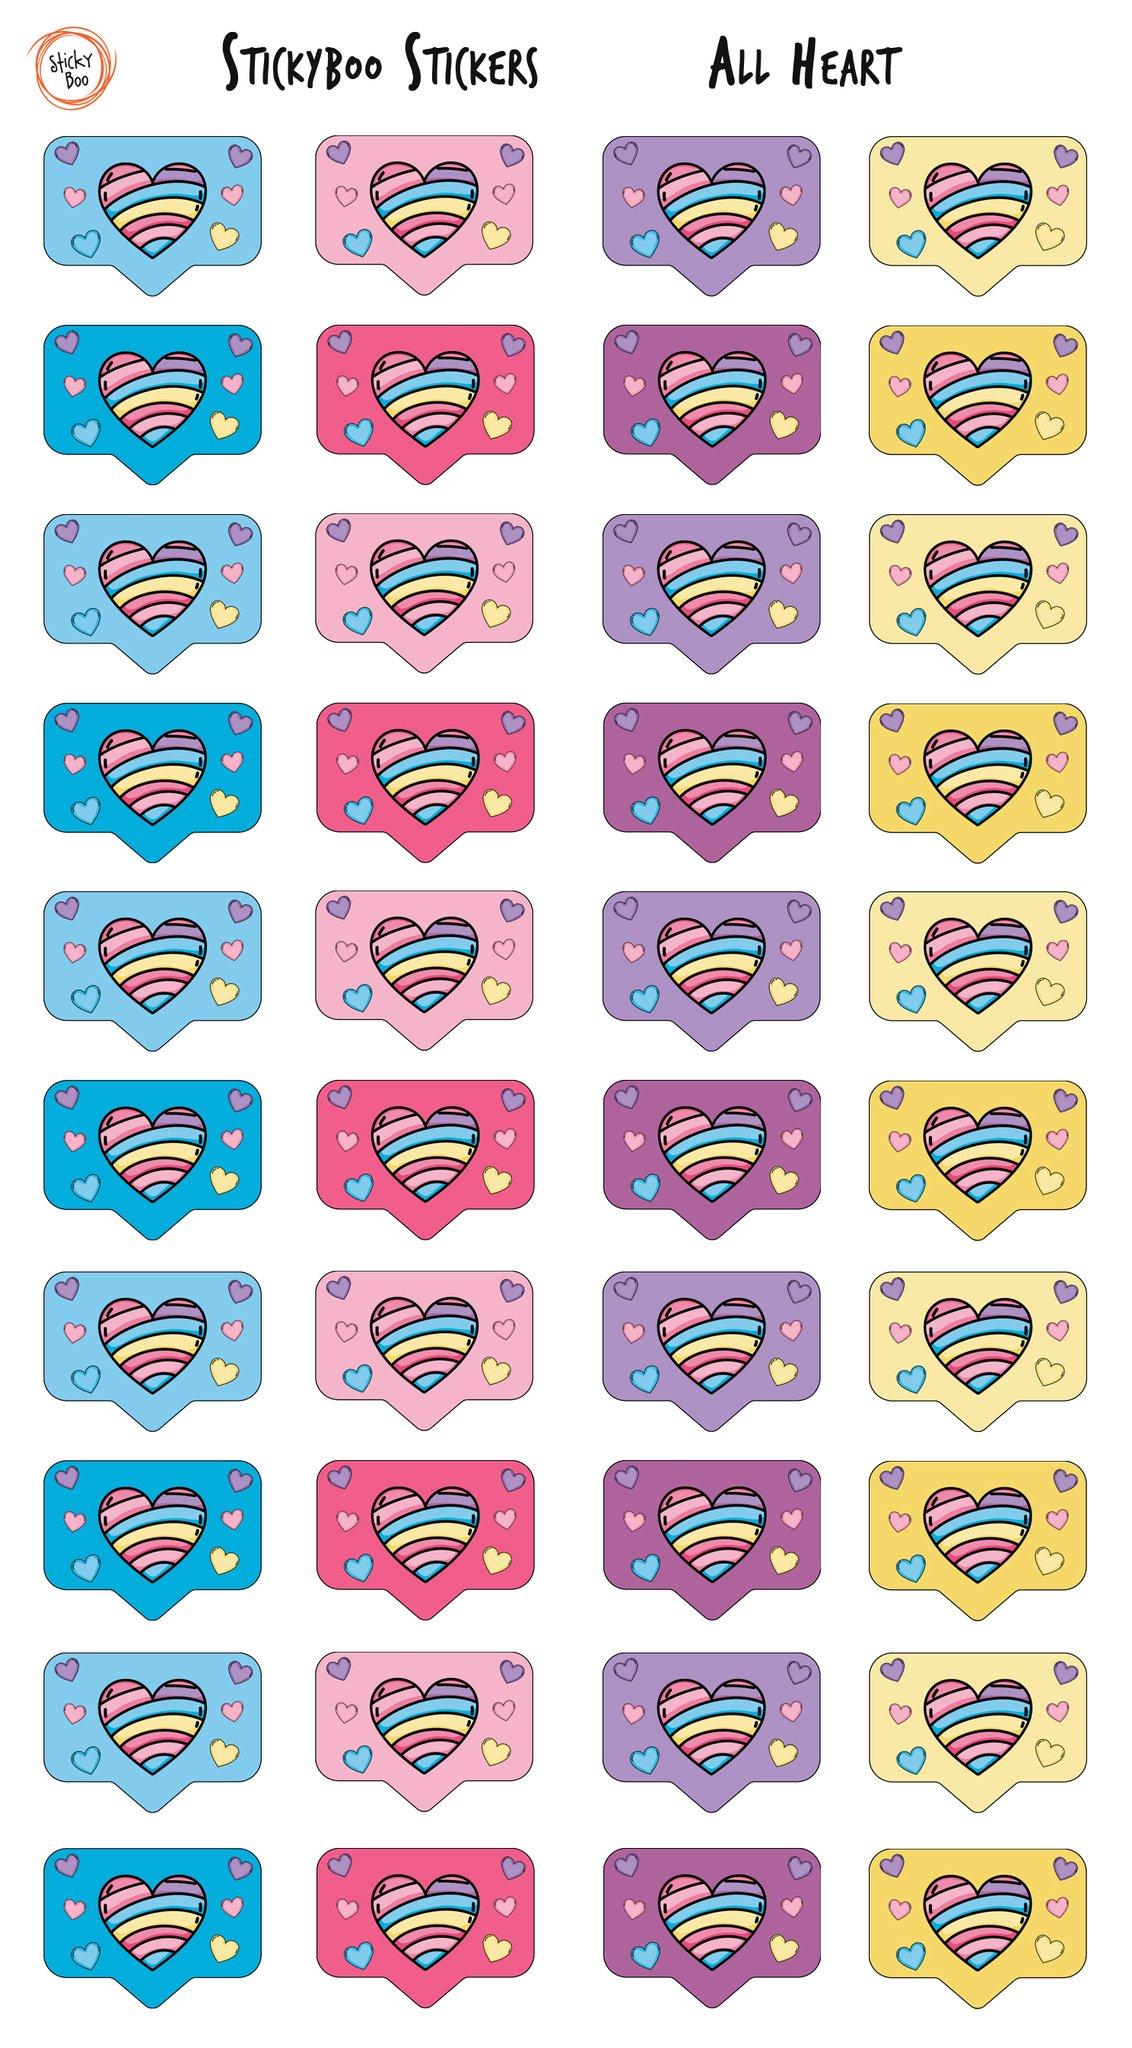 Sticky Boo Reward Stickers - All Heart